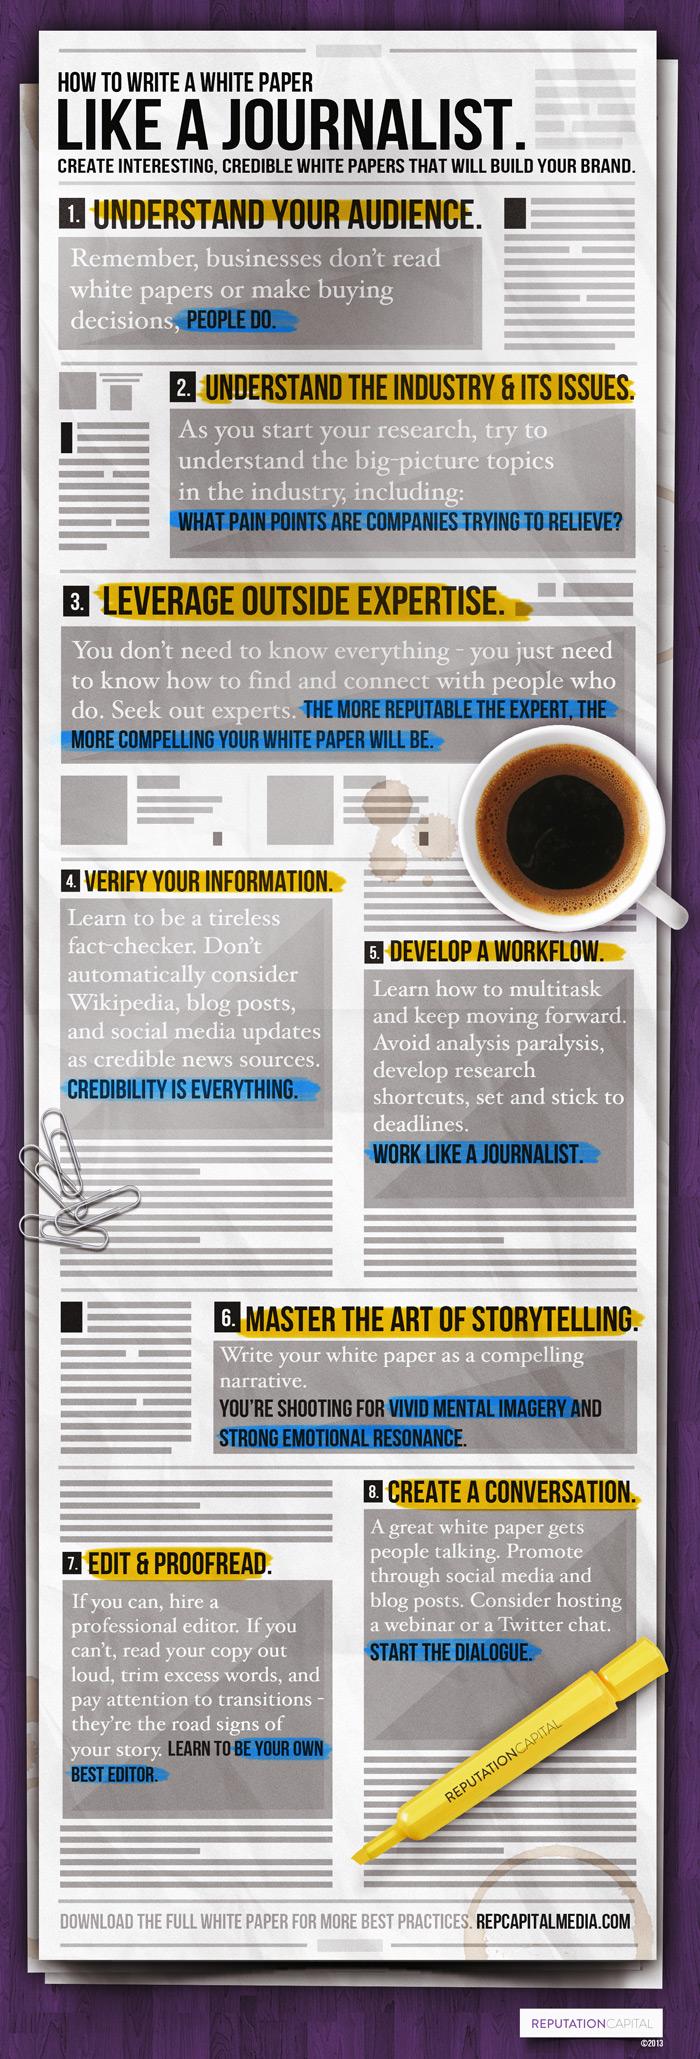 Blogging Like a Journalist